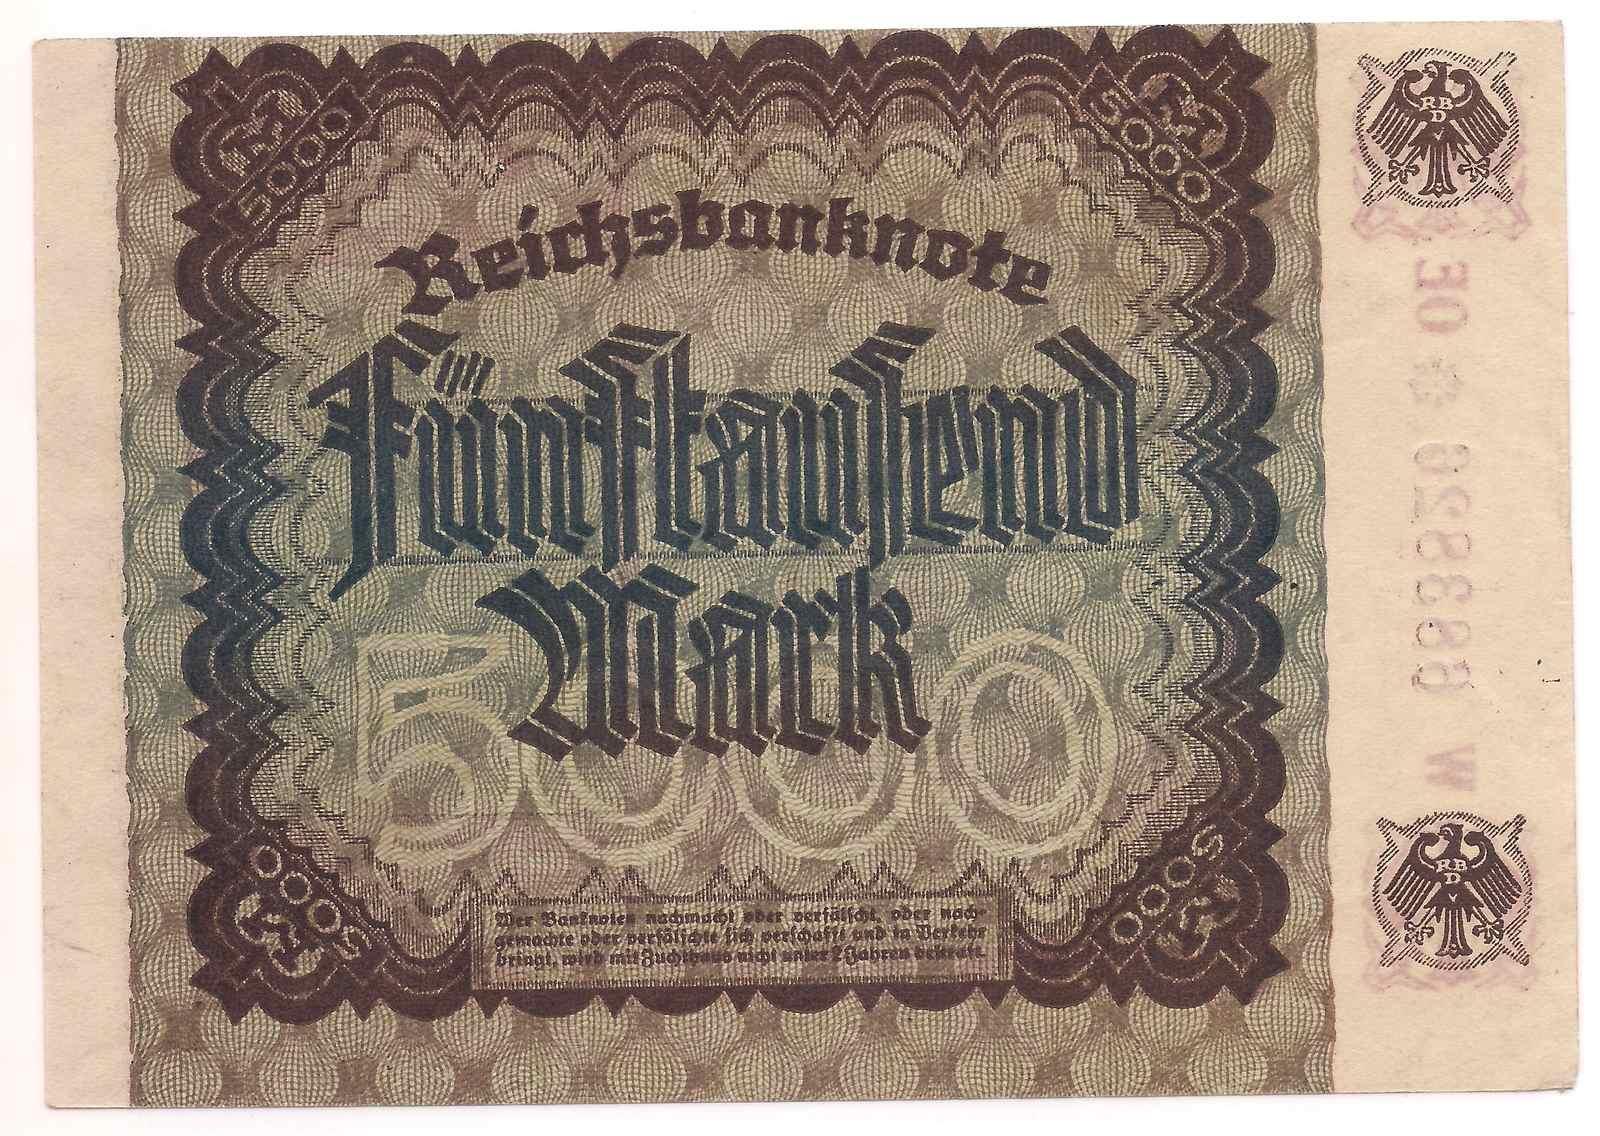 Alemanha 5.000 Mark 1922 - SOB/FE